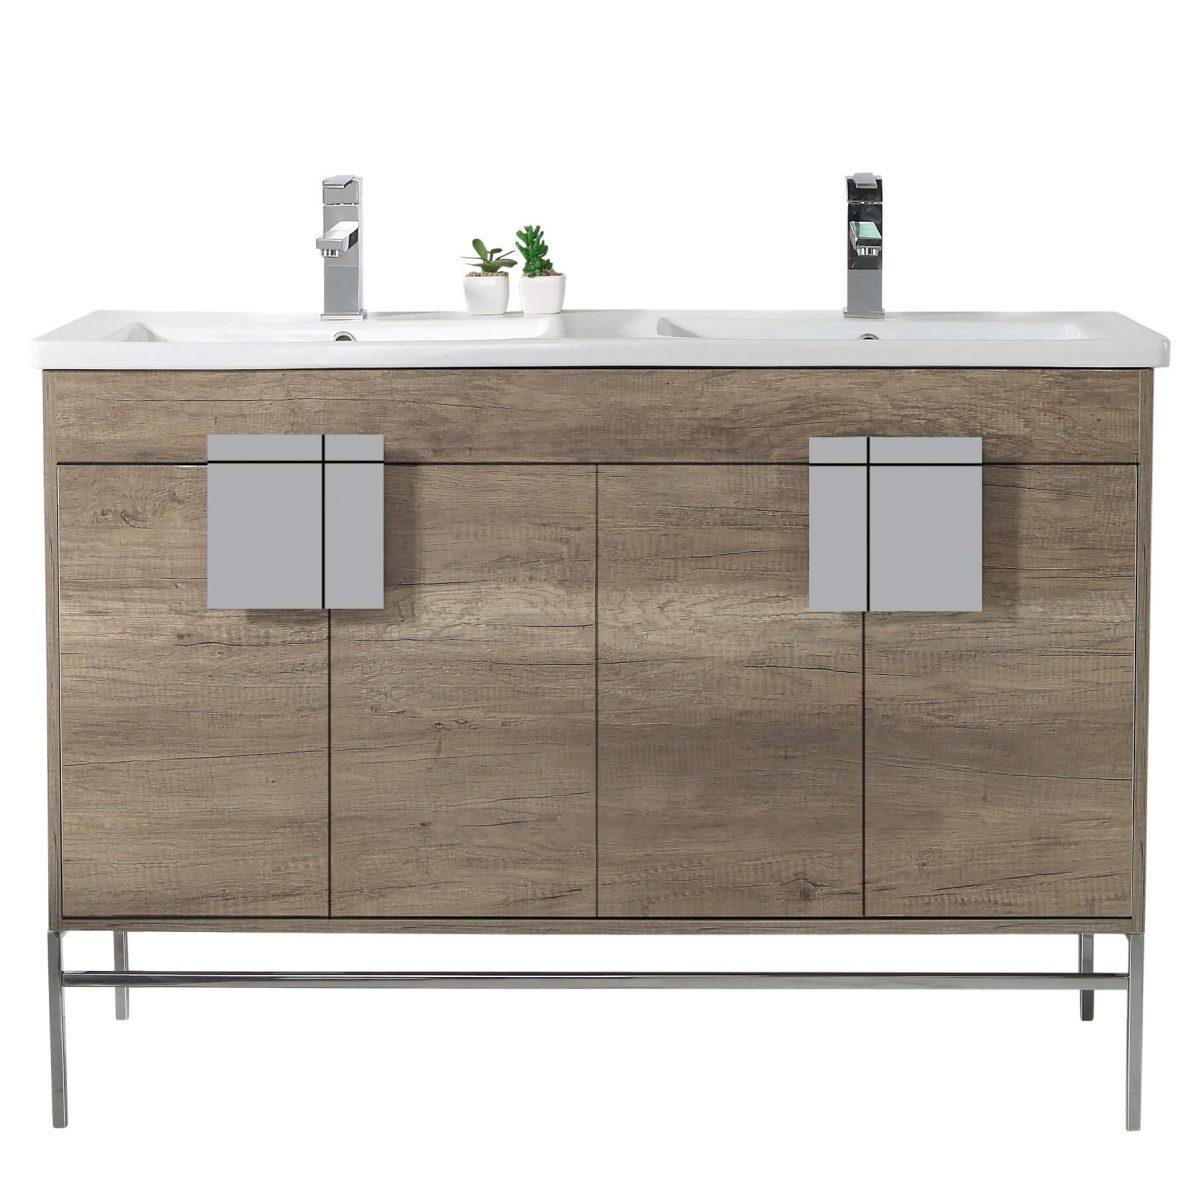 "Shawbridge 48"" Modern Double Bathroom Vanity  Shadow Gray with Polished Chrome Hardware"